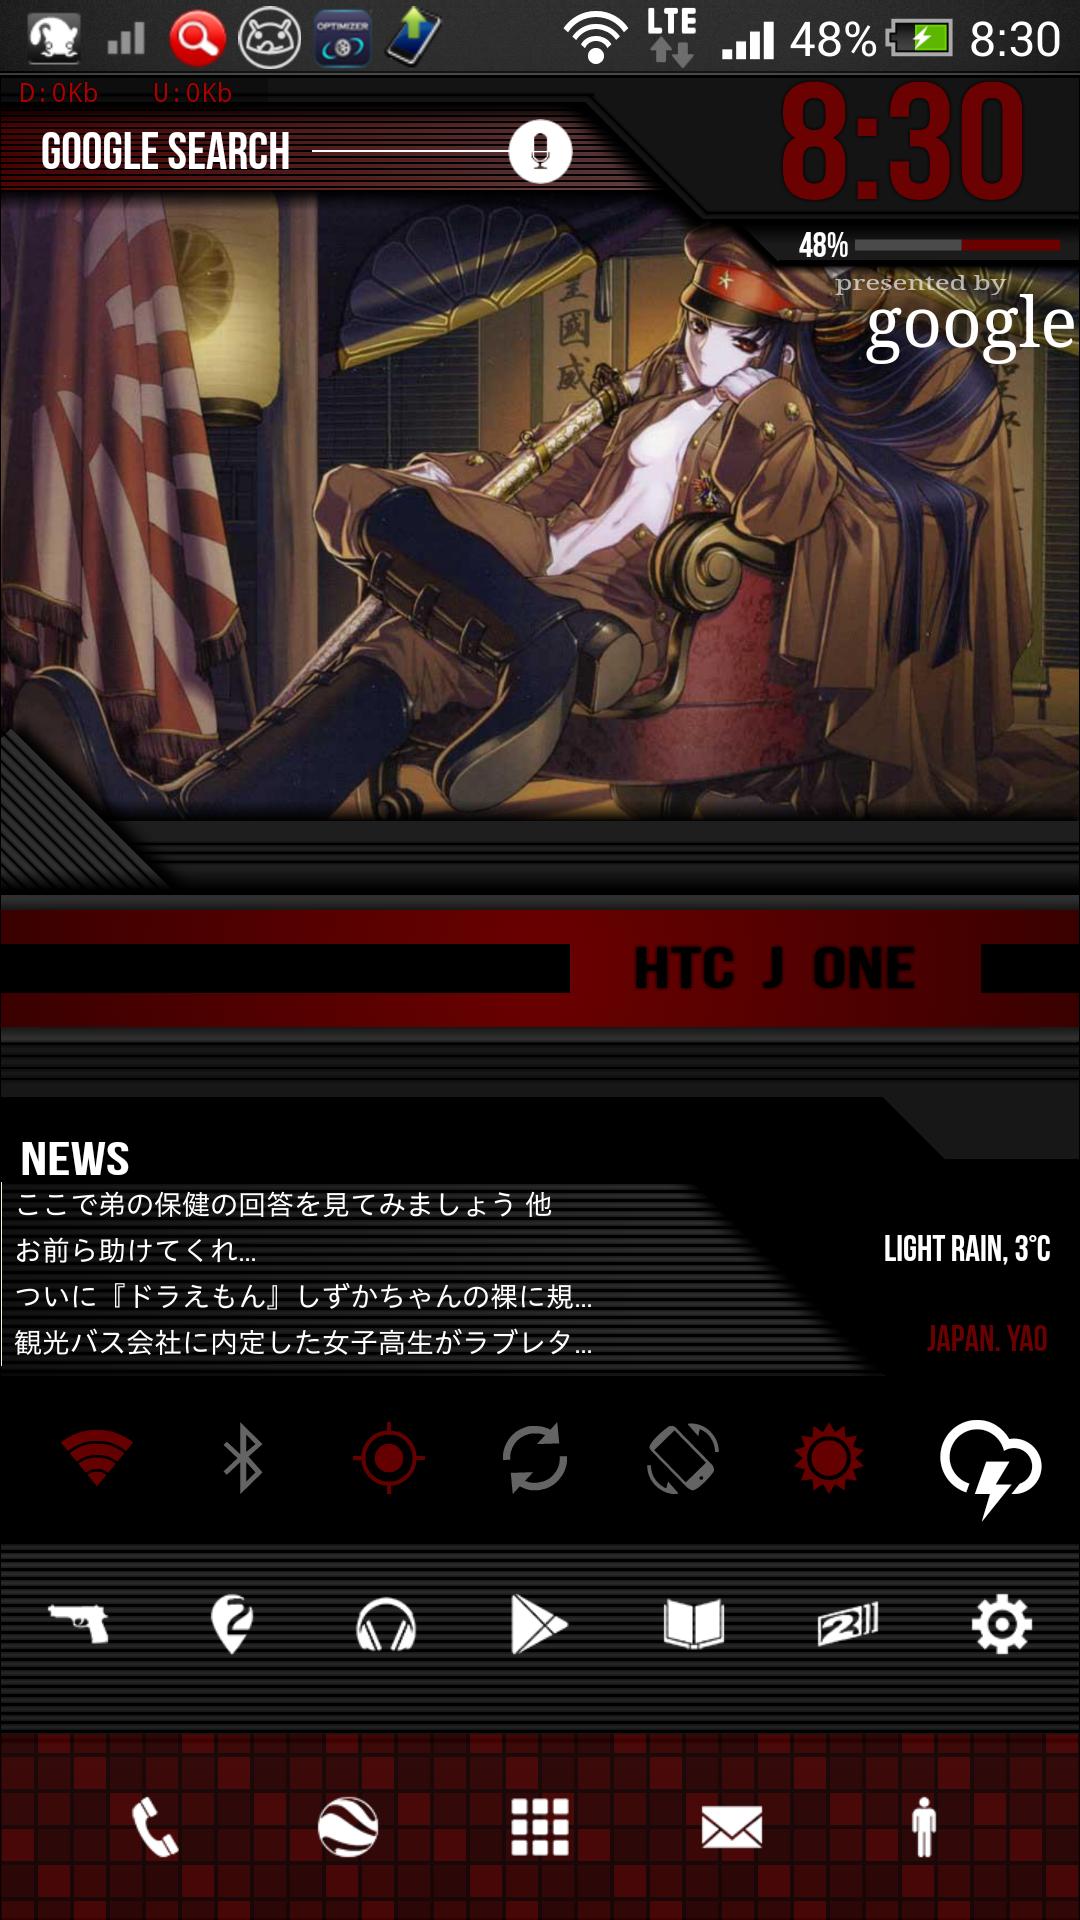 Screenshot_2014-03-12-08-30-52.png